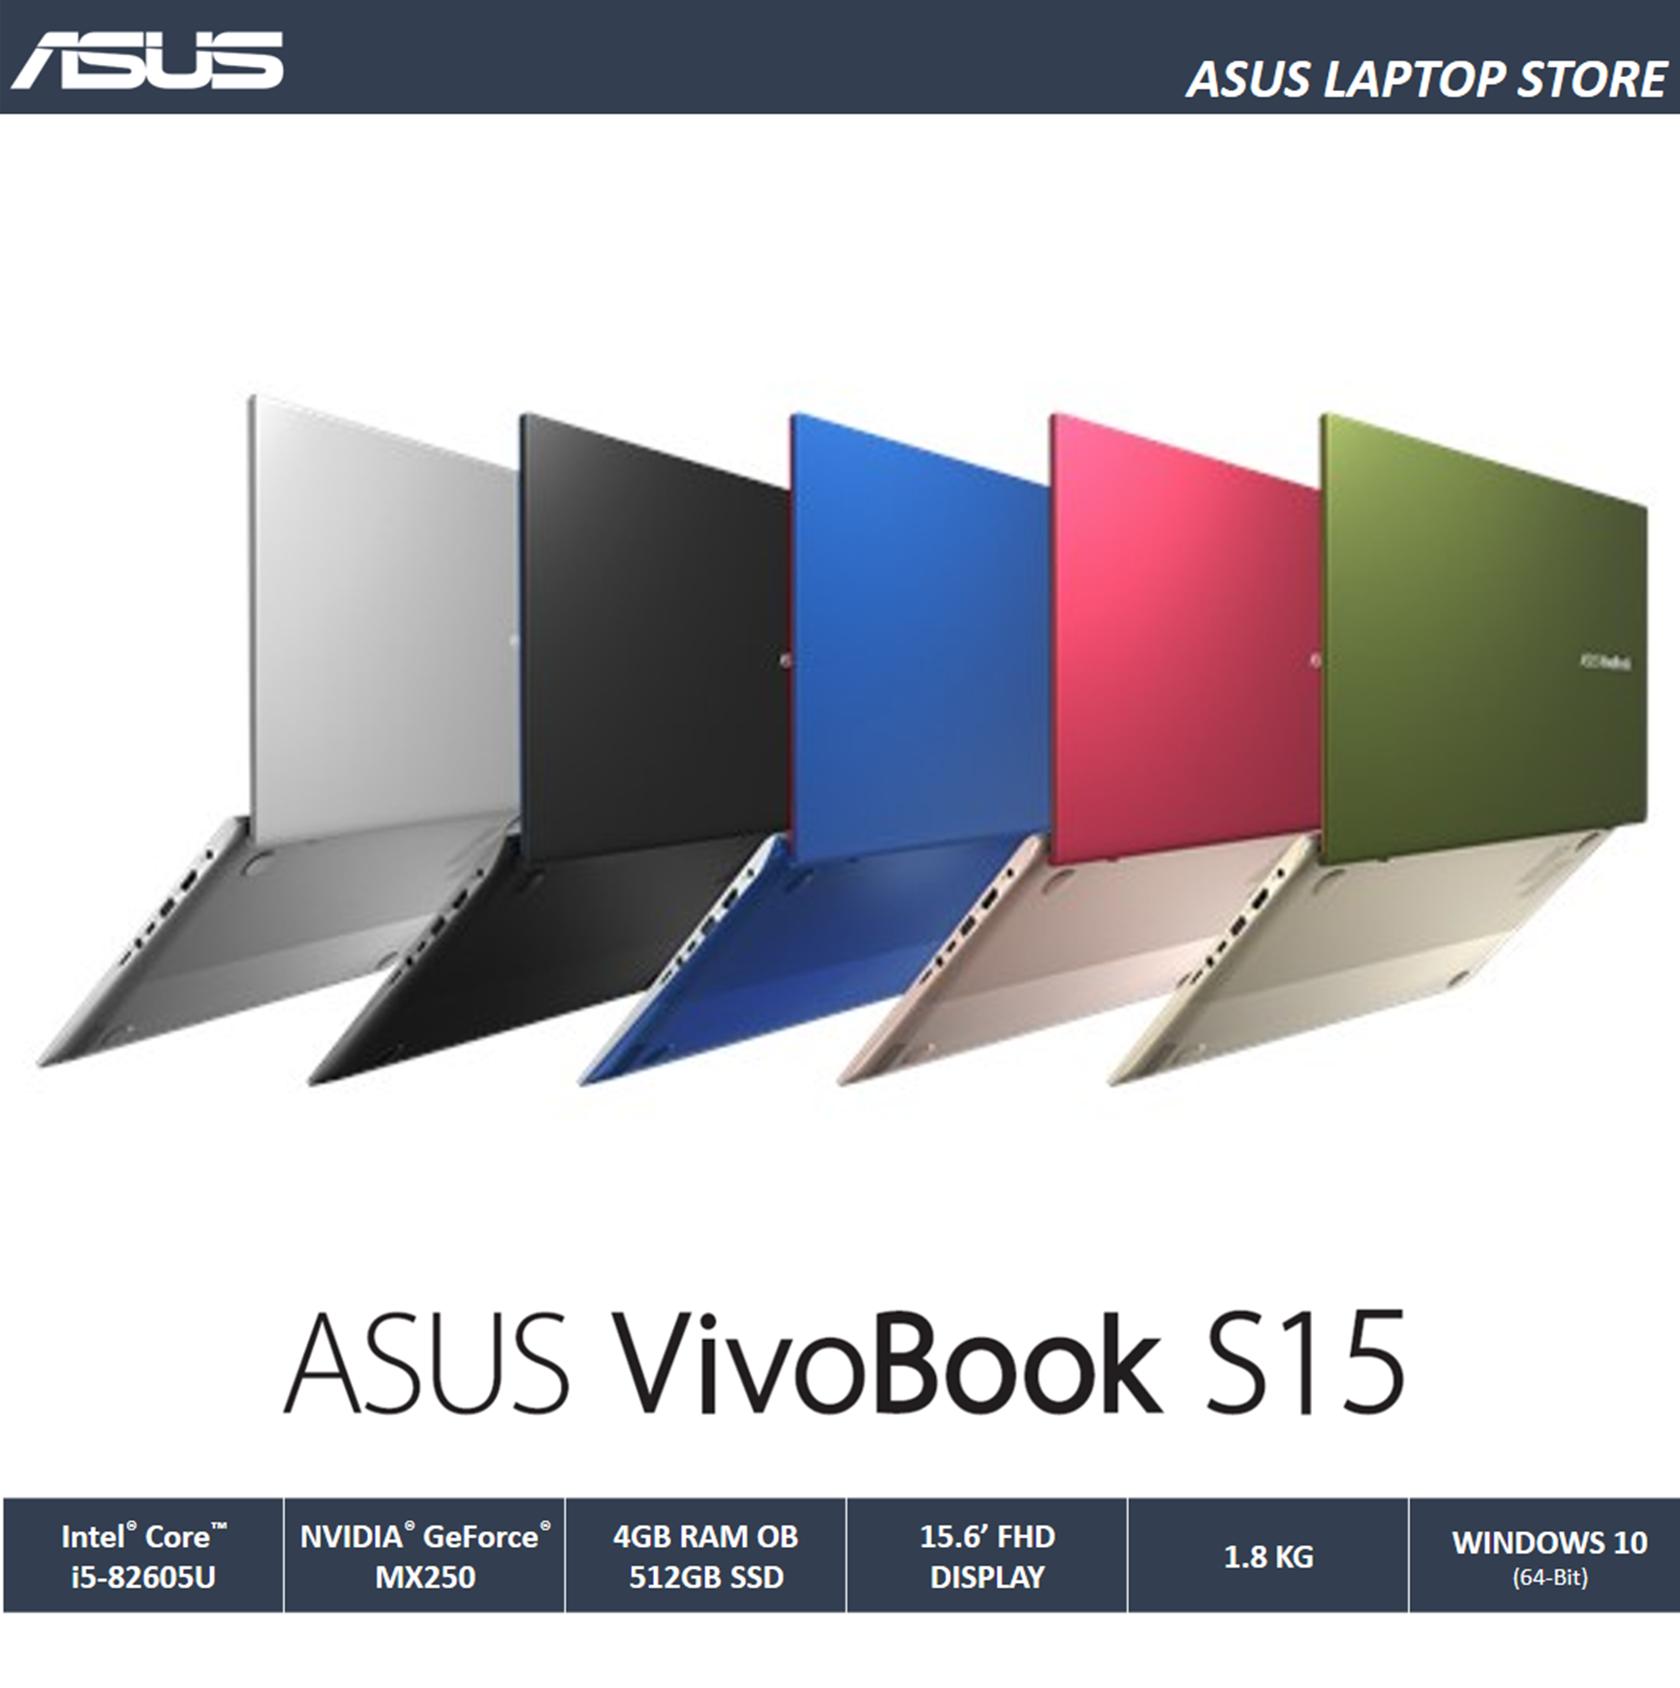 Asus Vivobook S S531 15   Laptop (I5-8265U/4GB OB/512GB SSD/MX250 2GB) Free Backpack Malaysia